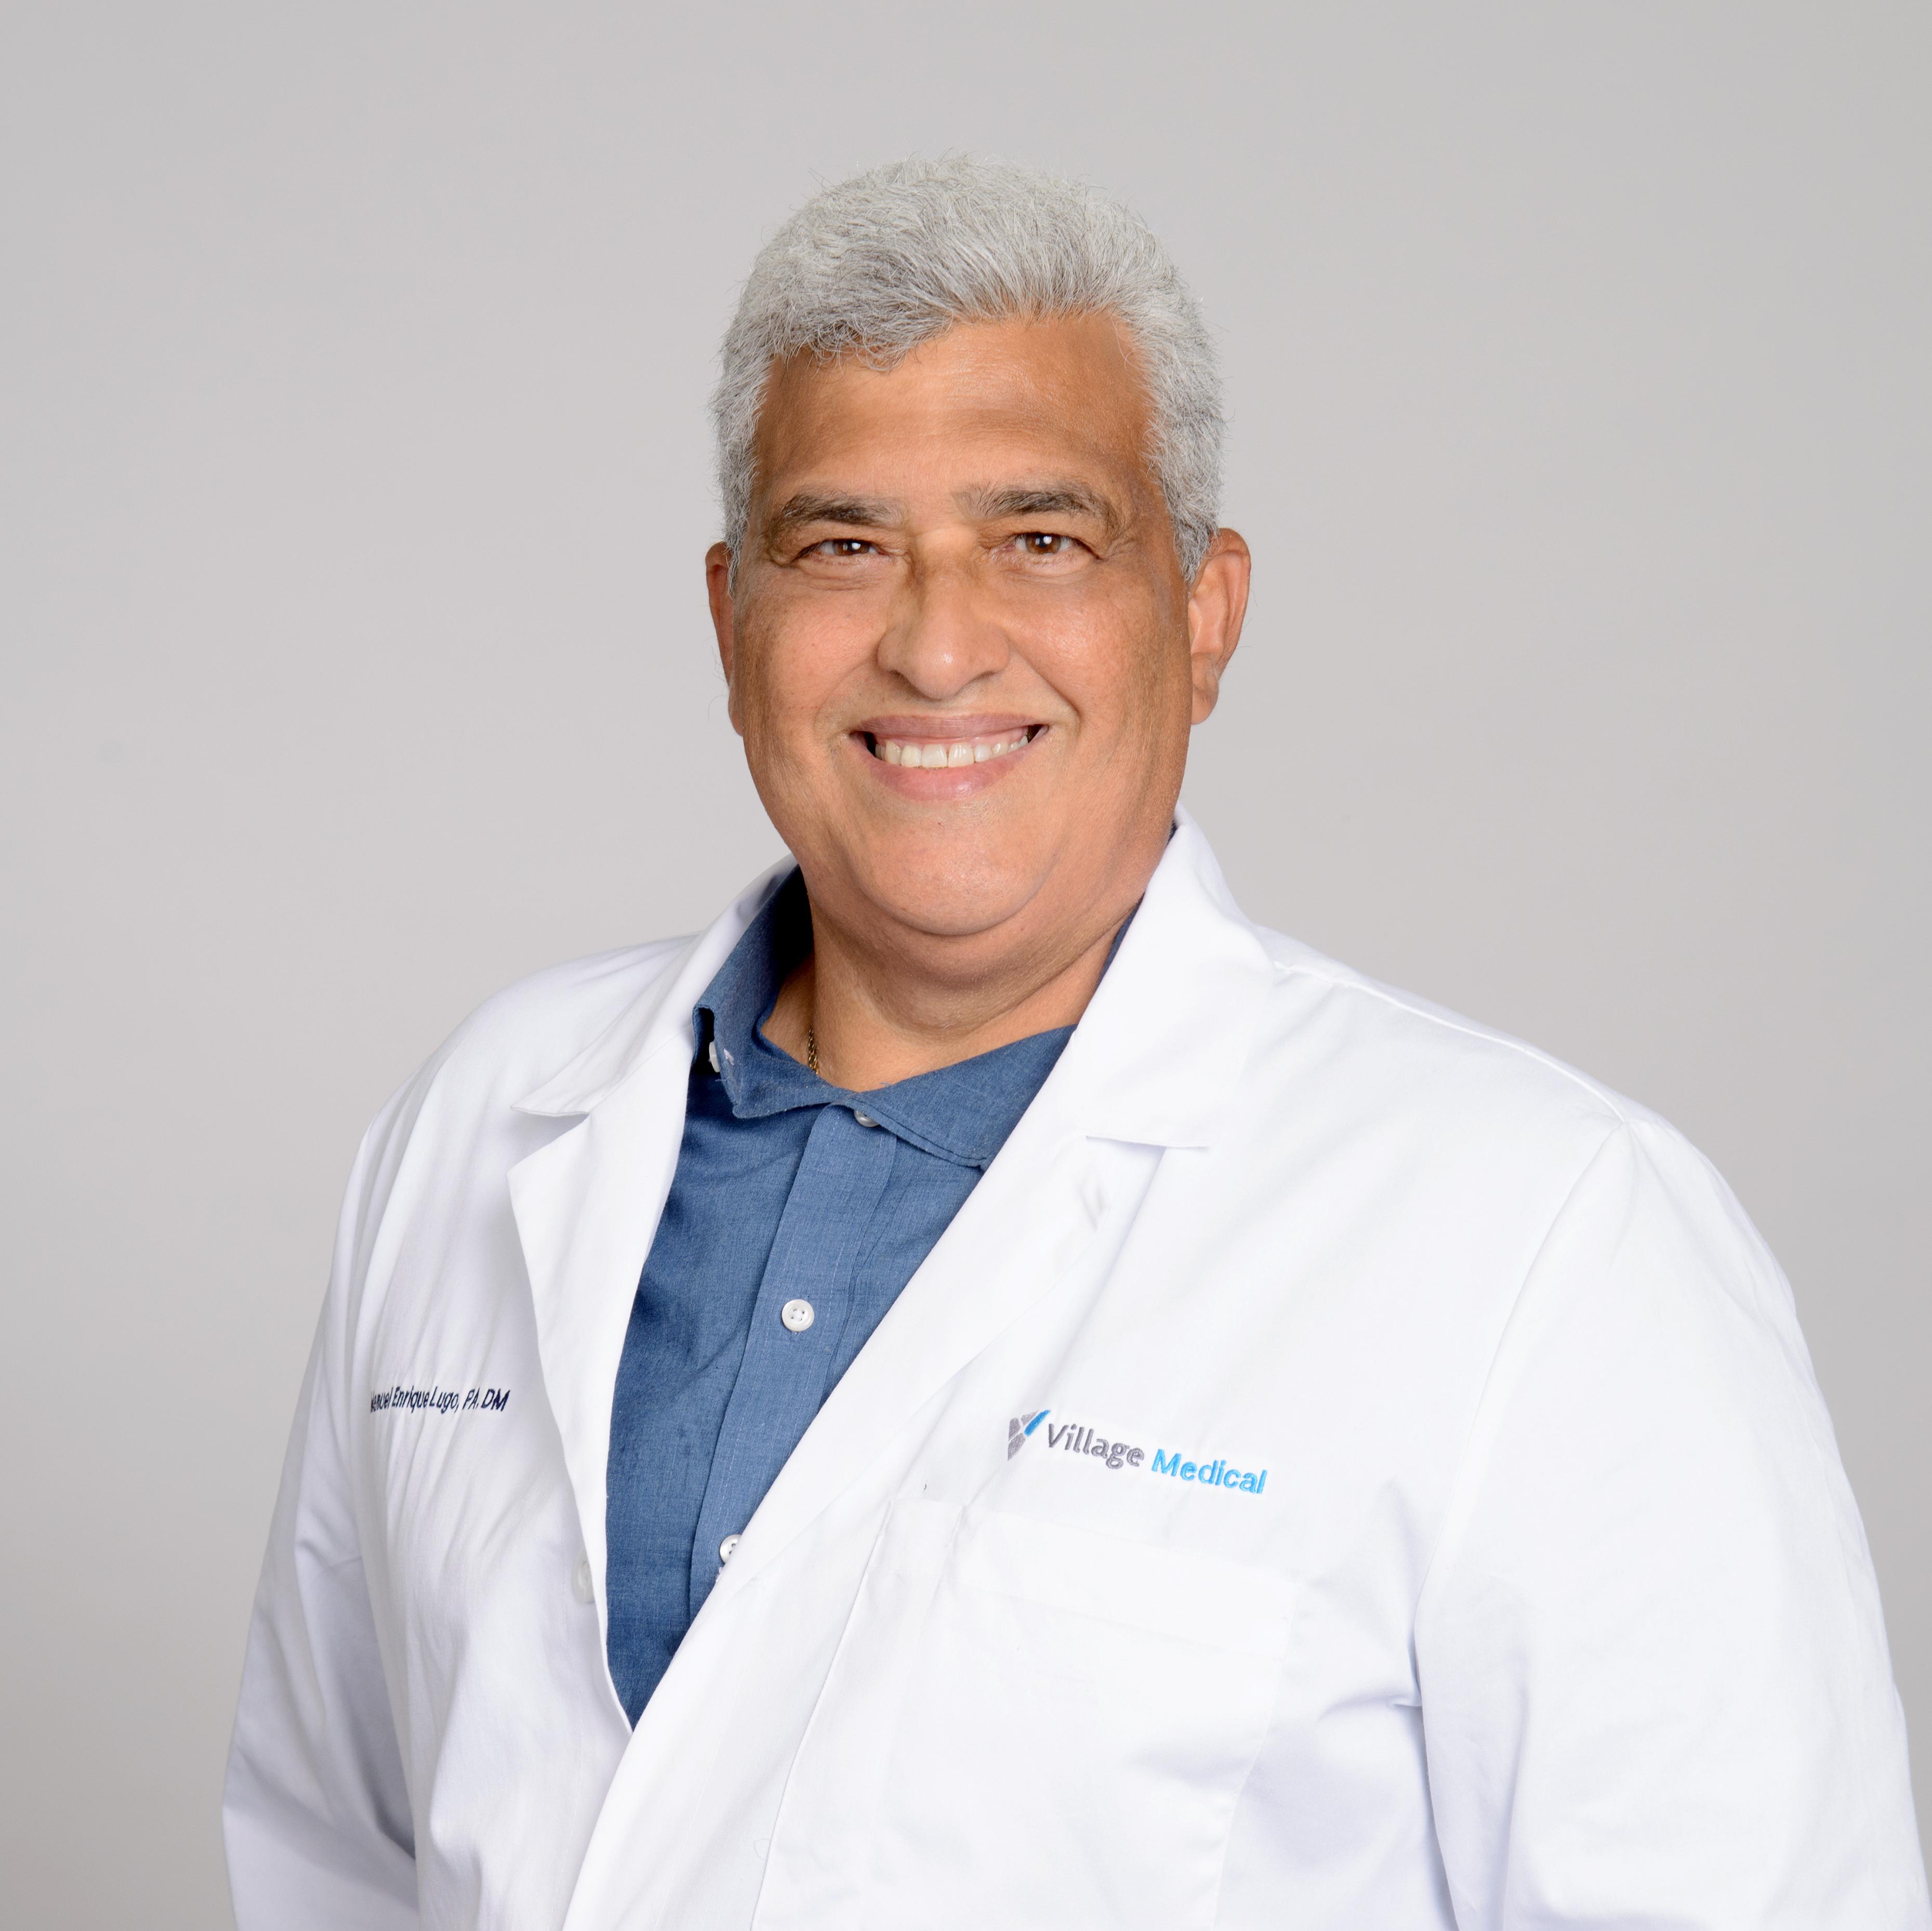 Manuel Lugo, PA